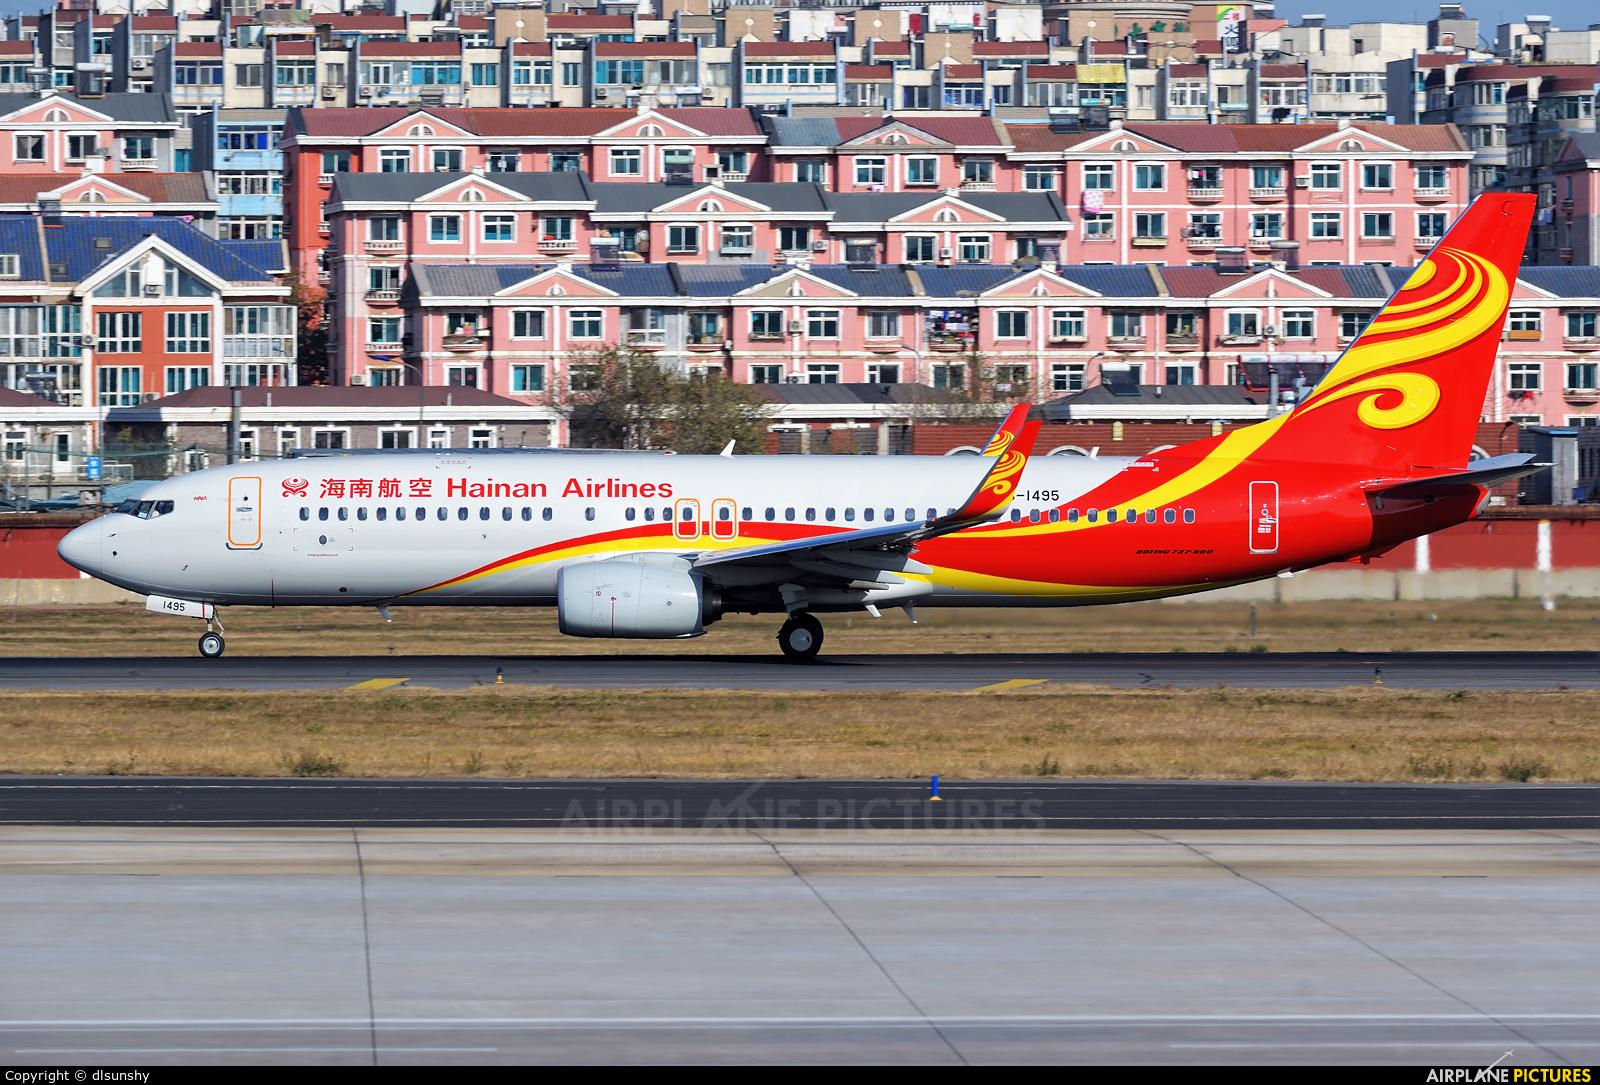 Hainan Airlines B-1495 aircraft at Dalian Zhoushuizi Int'l